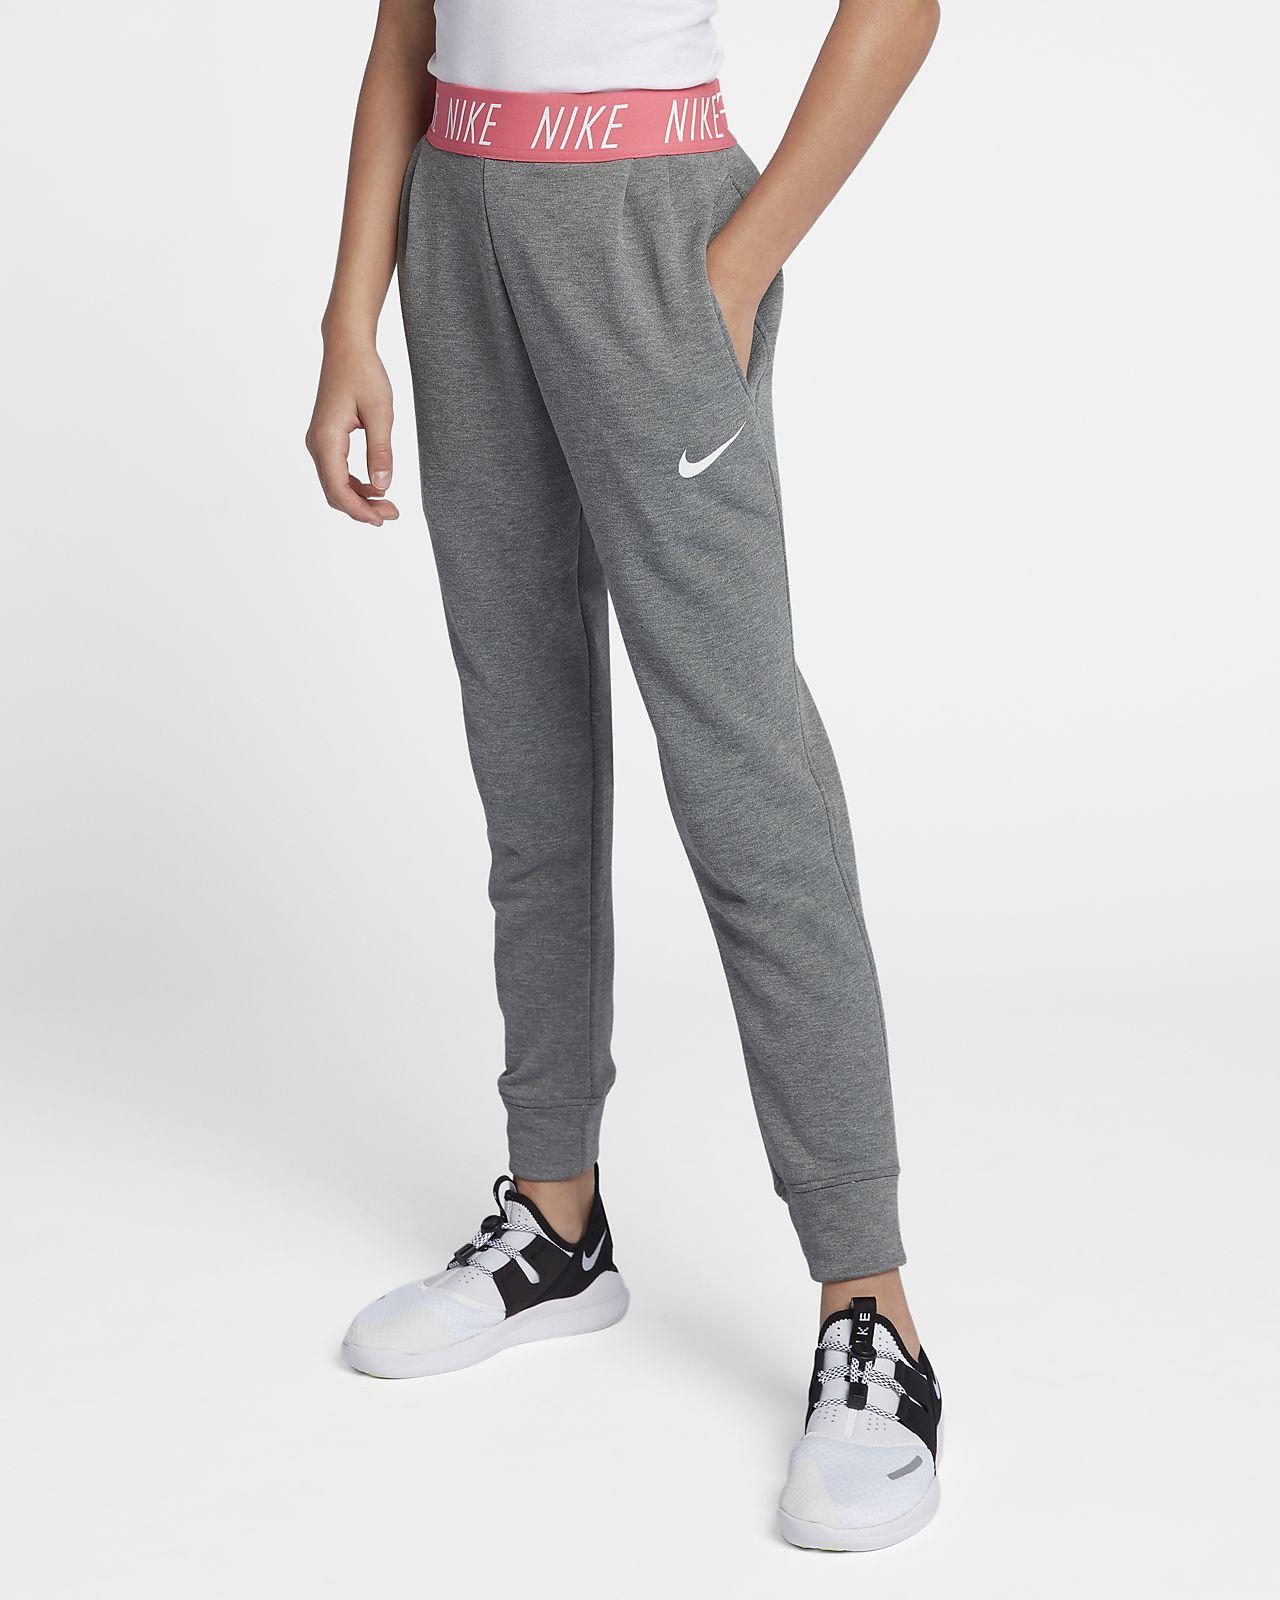 Nike Dri-FIT Core Studio Trainingshose für ältere Kinder (Mädchen)